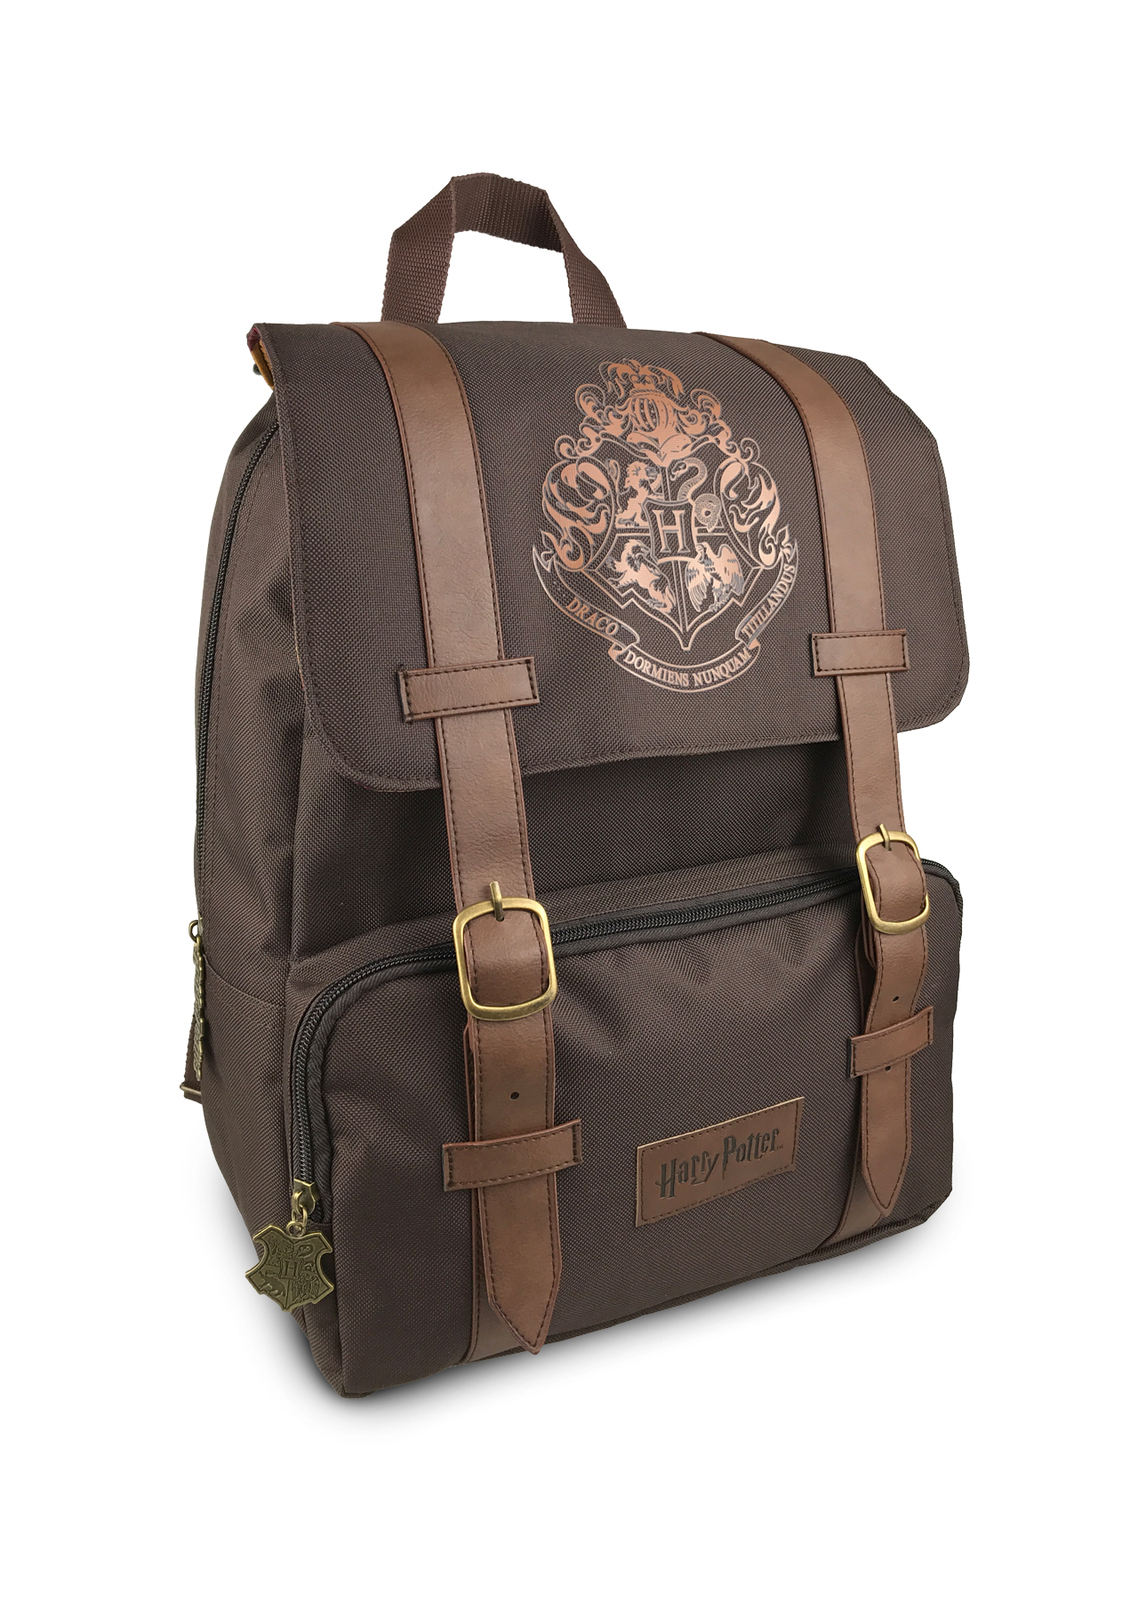 Harry Potter BackpackHogwarts BackpackOfficially LicensedRoxy Rucksack